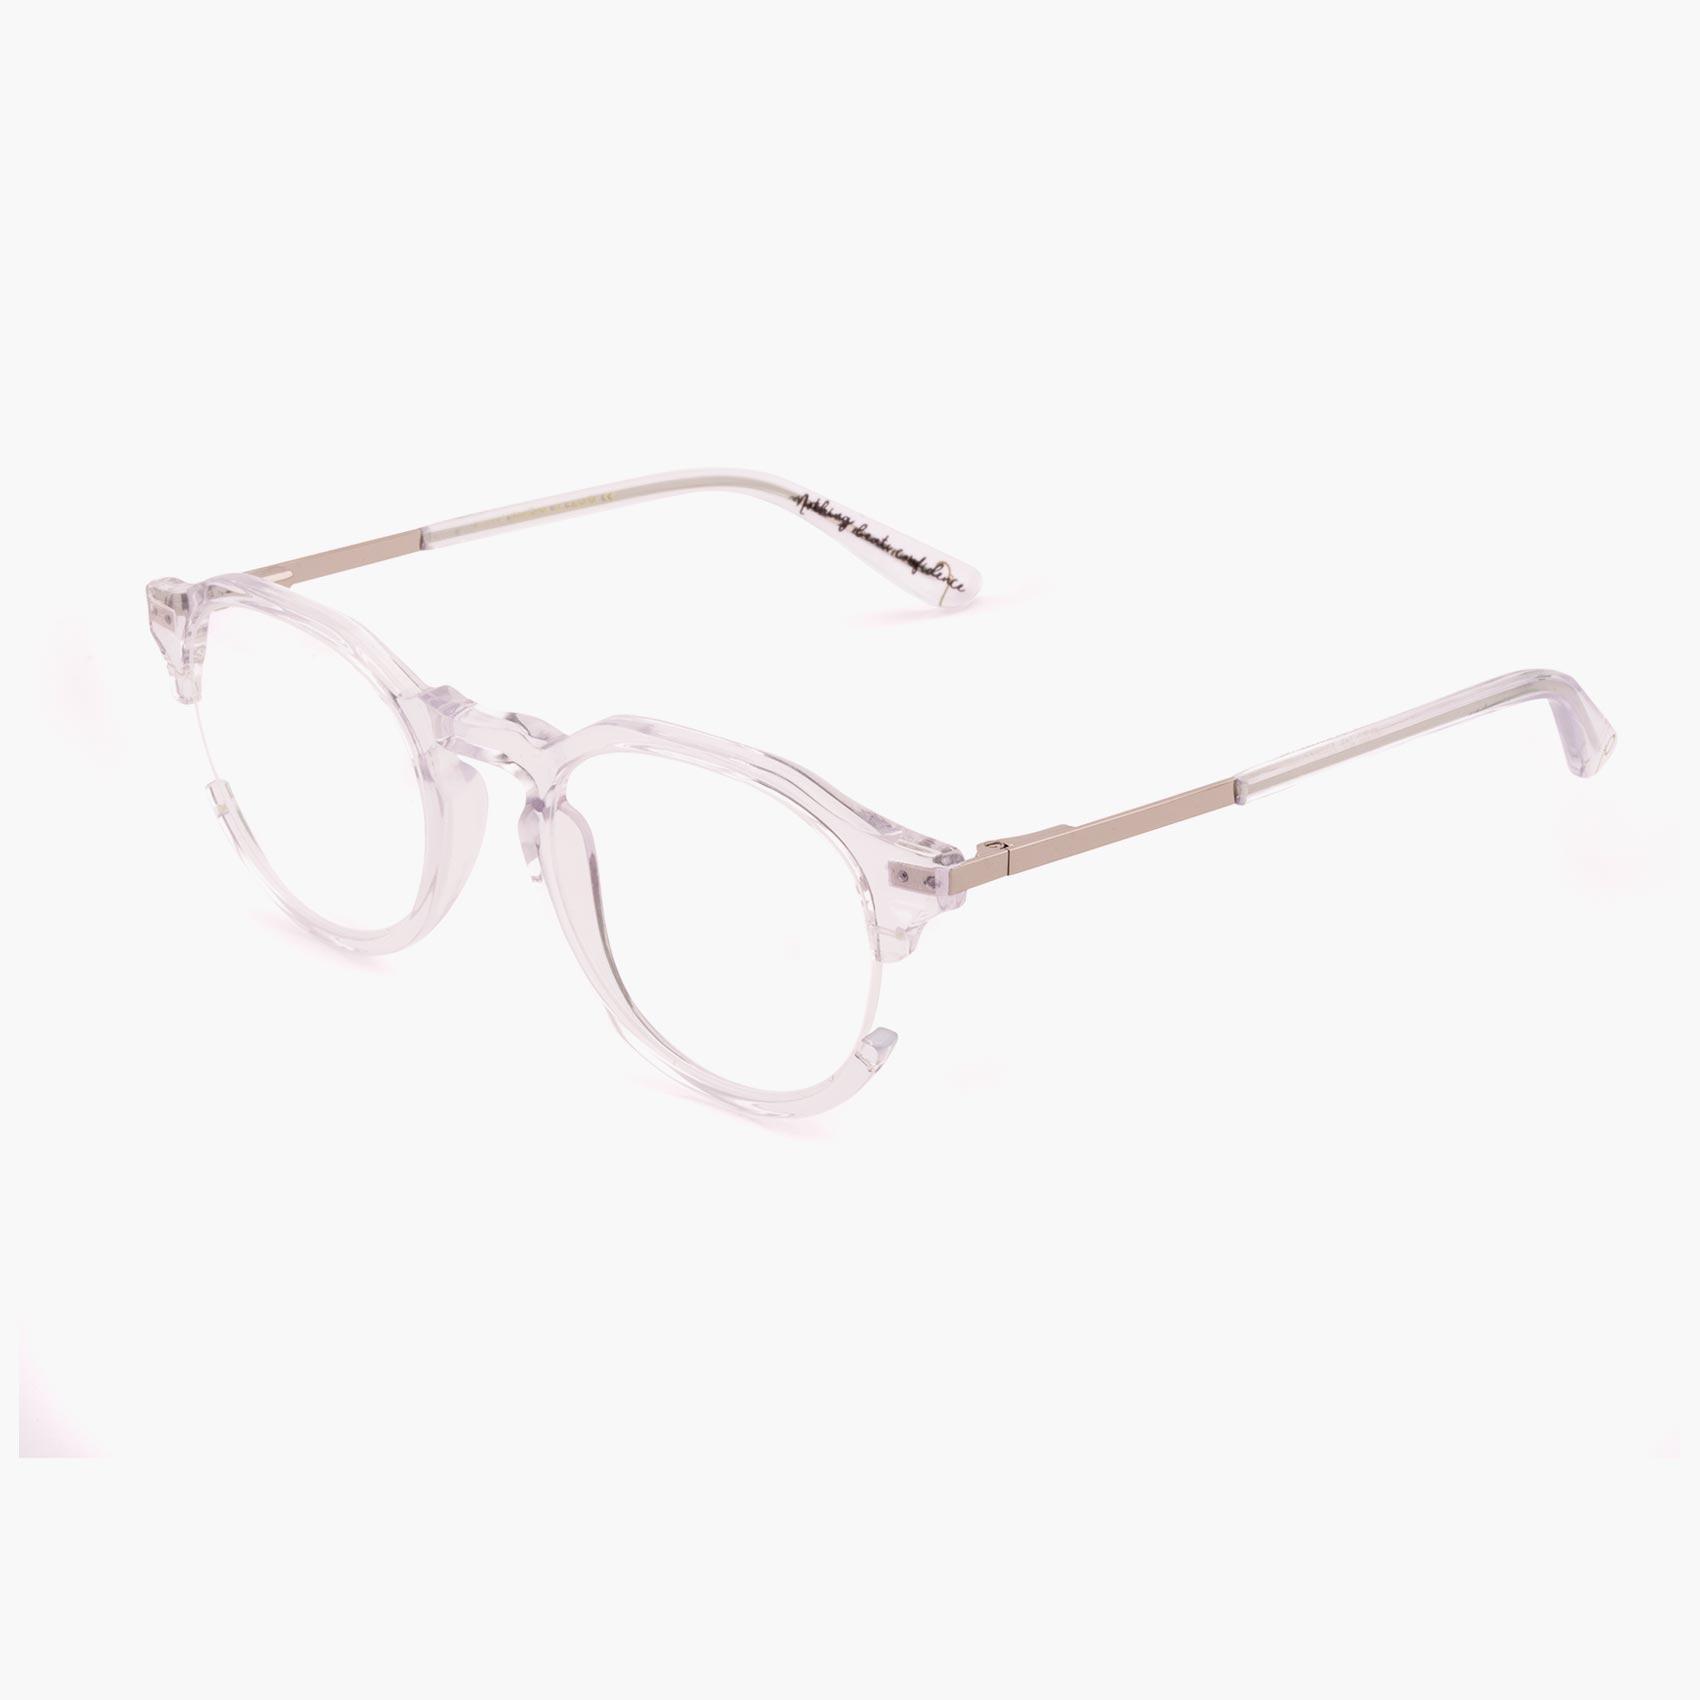 Proud eyewear Jodie C4 P gafas de vista mujer transparentes